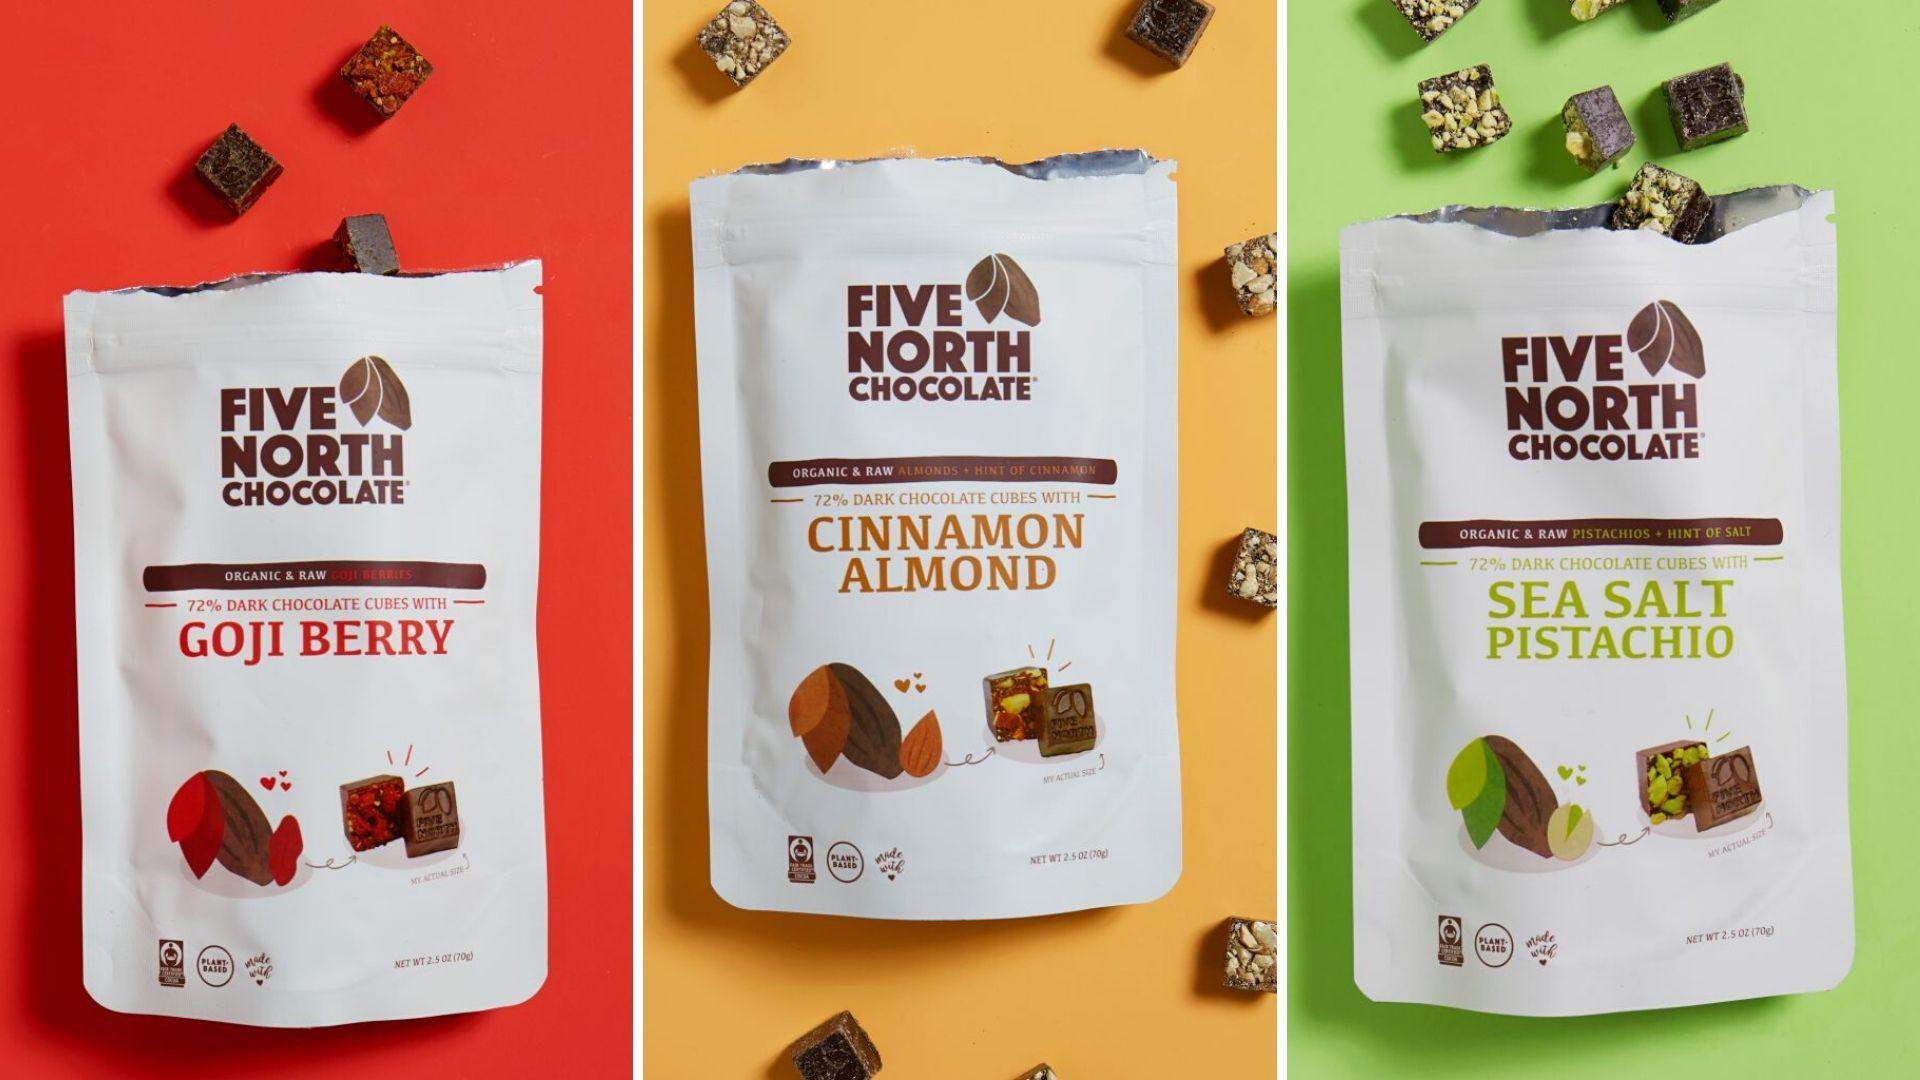 Image: Five North Chocolate Gogi Berry, Cinnamon Almond, and Pistachio chocolates